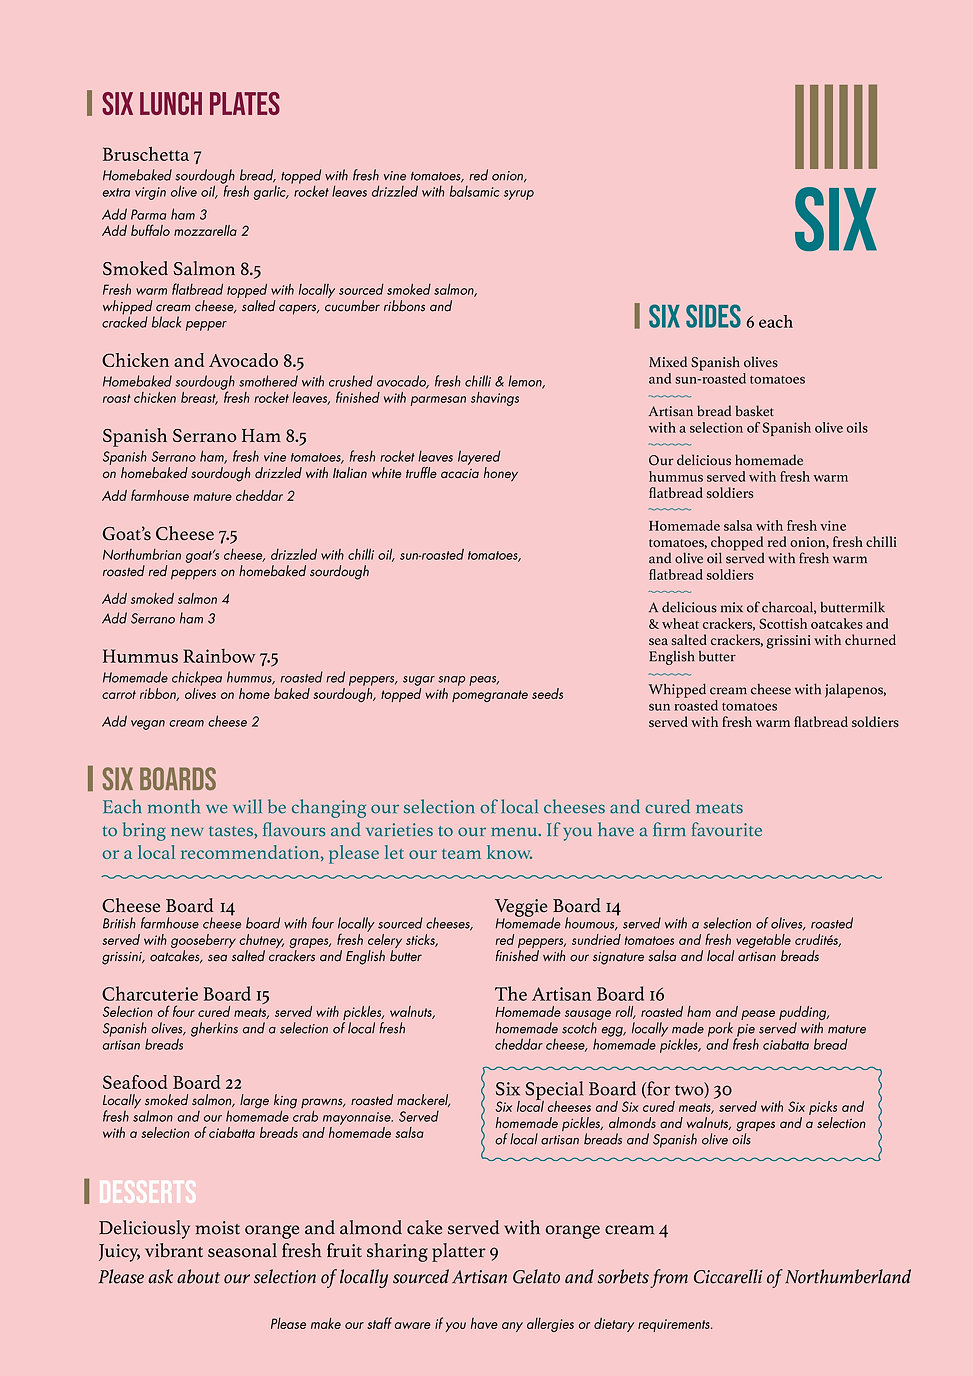 The Six Food menu